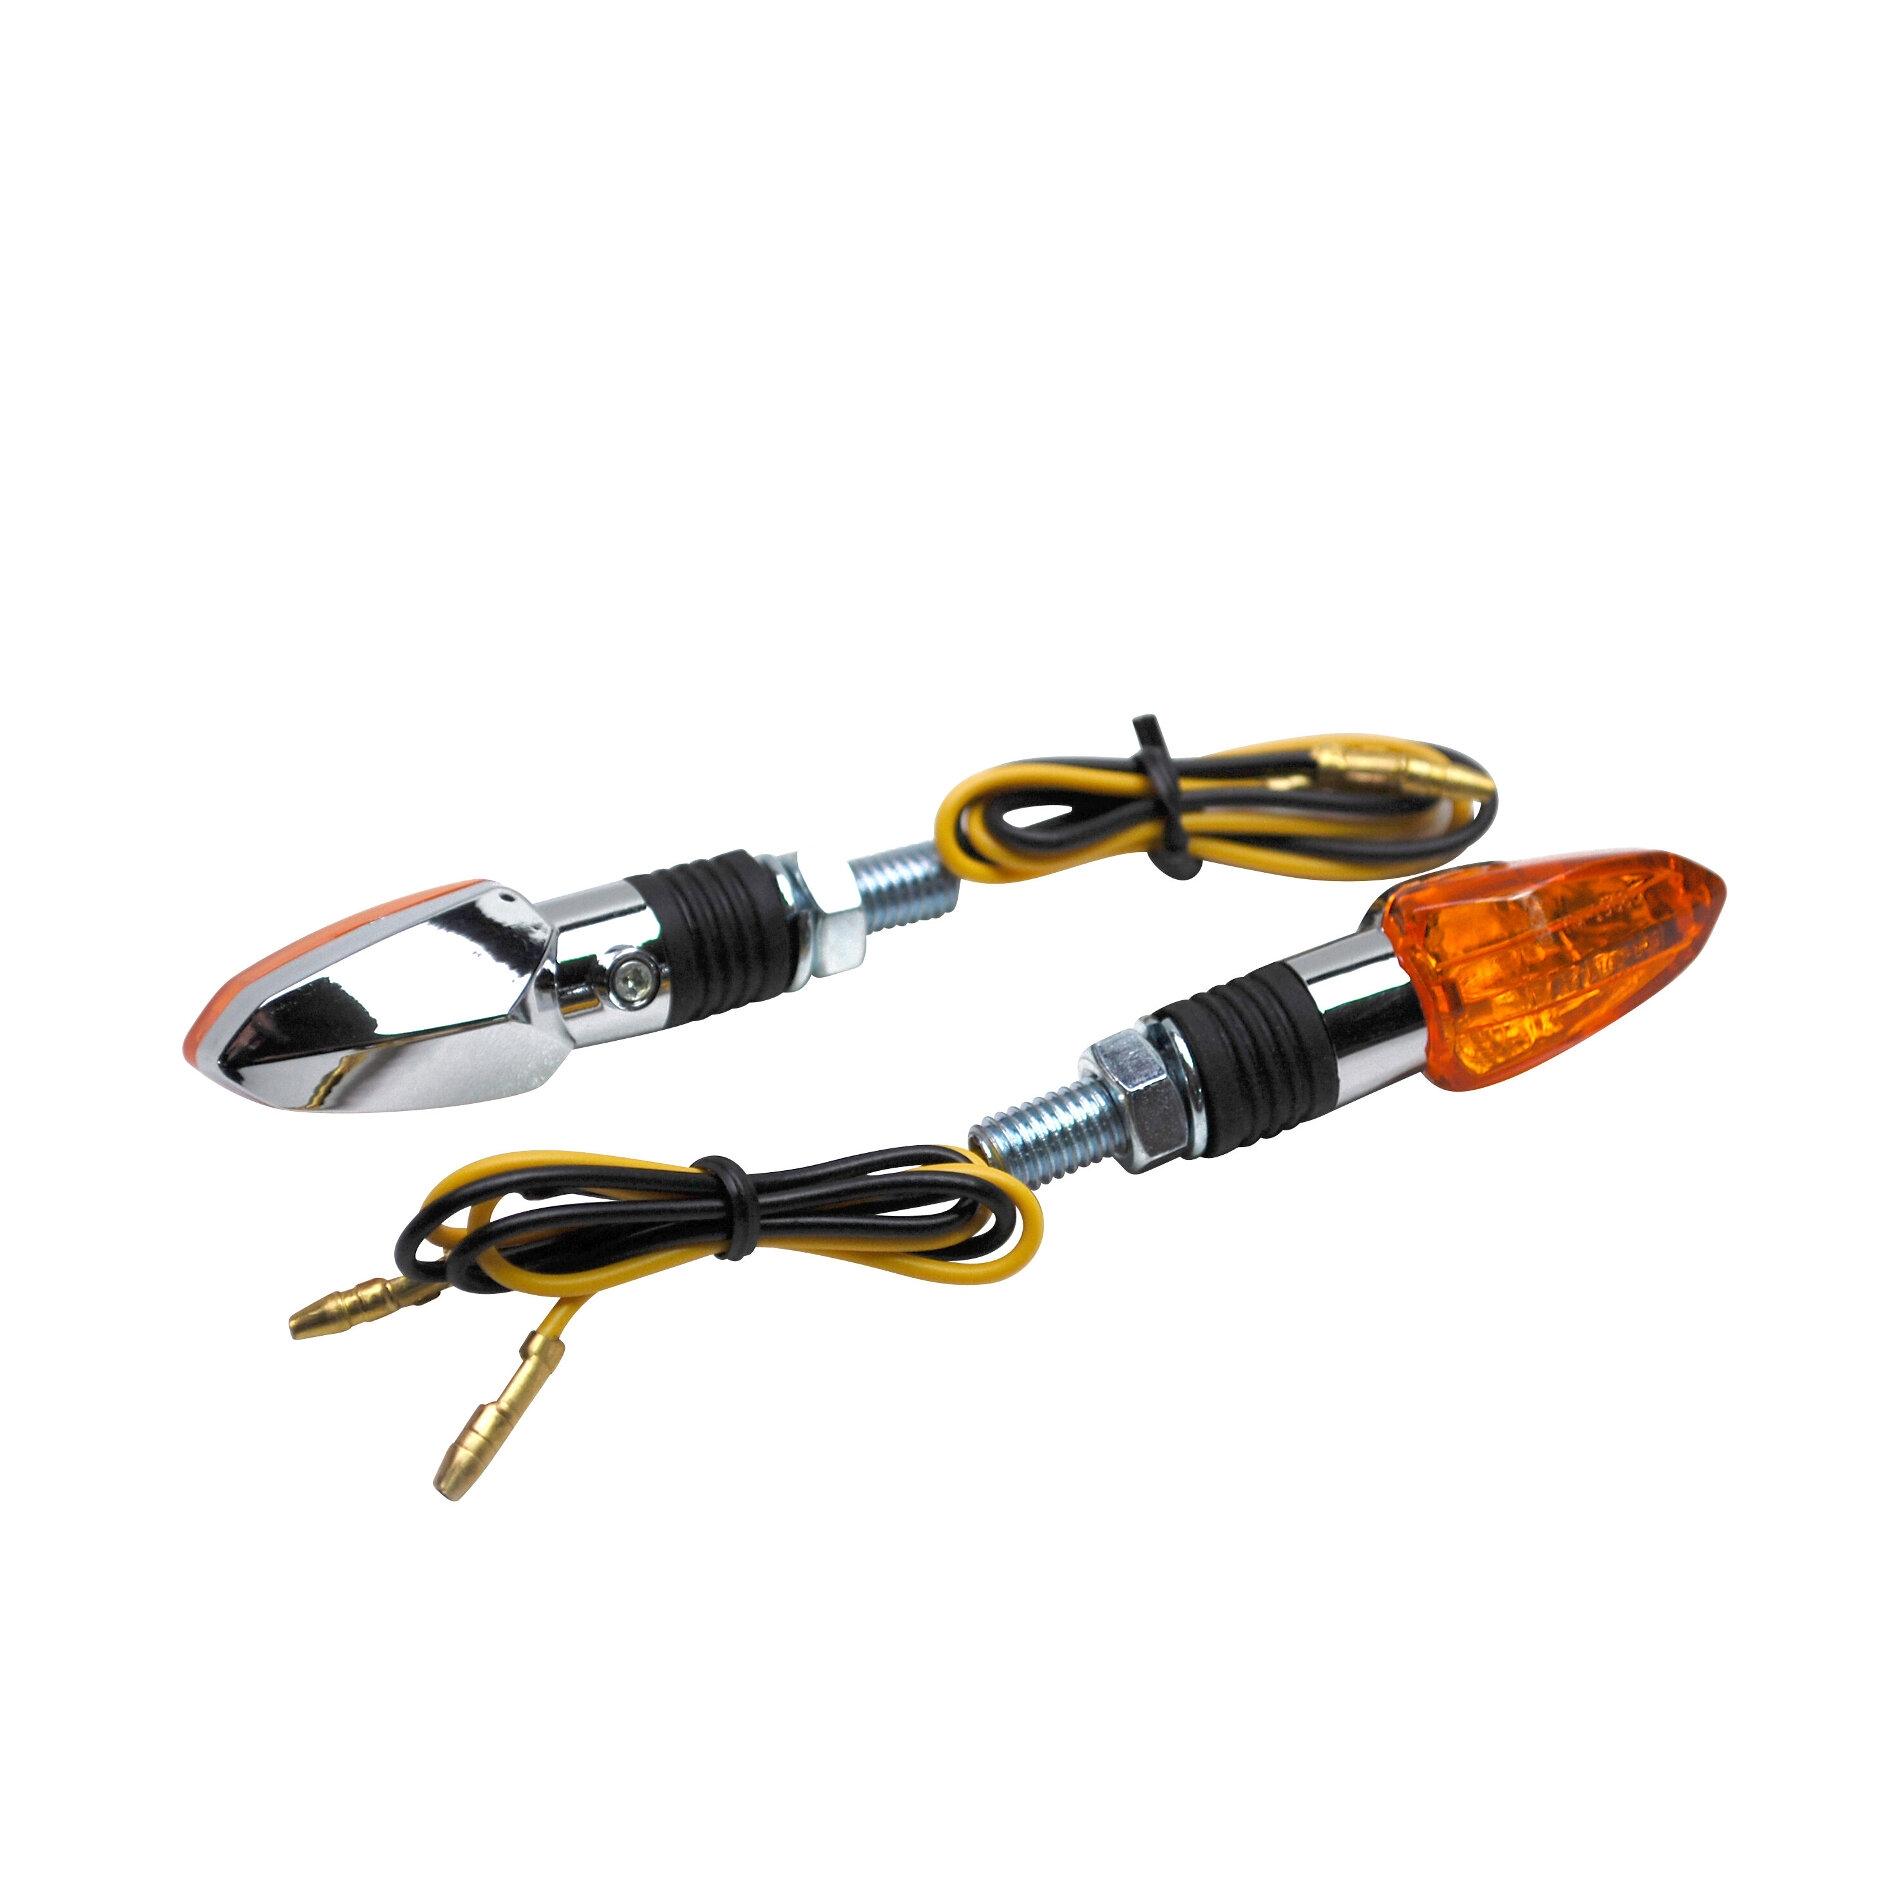 Clignotants Replay micro flèche chrome ampoule orange